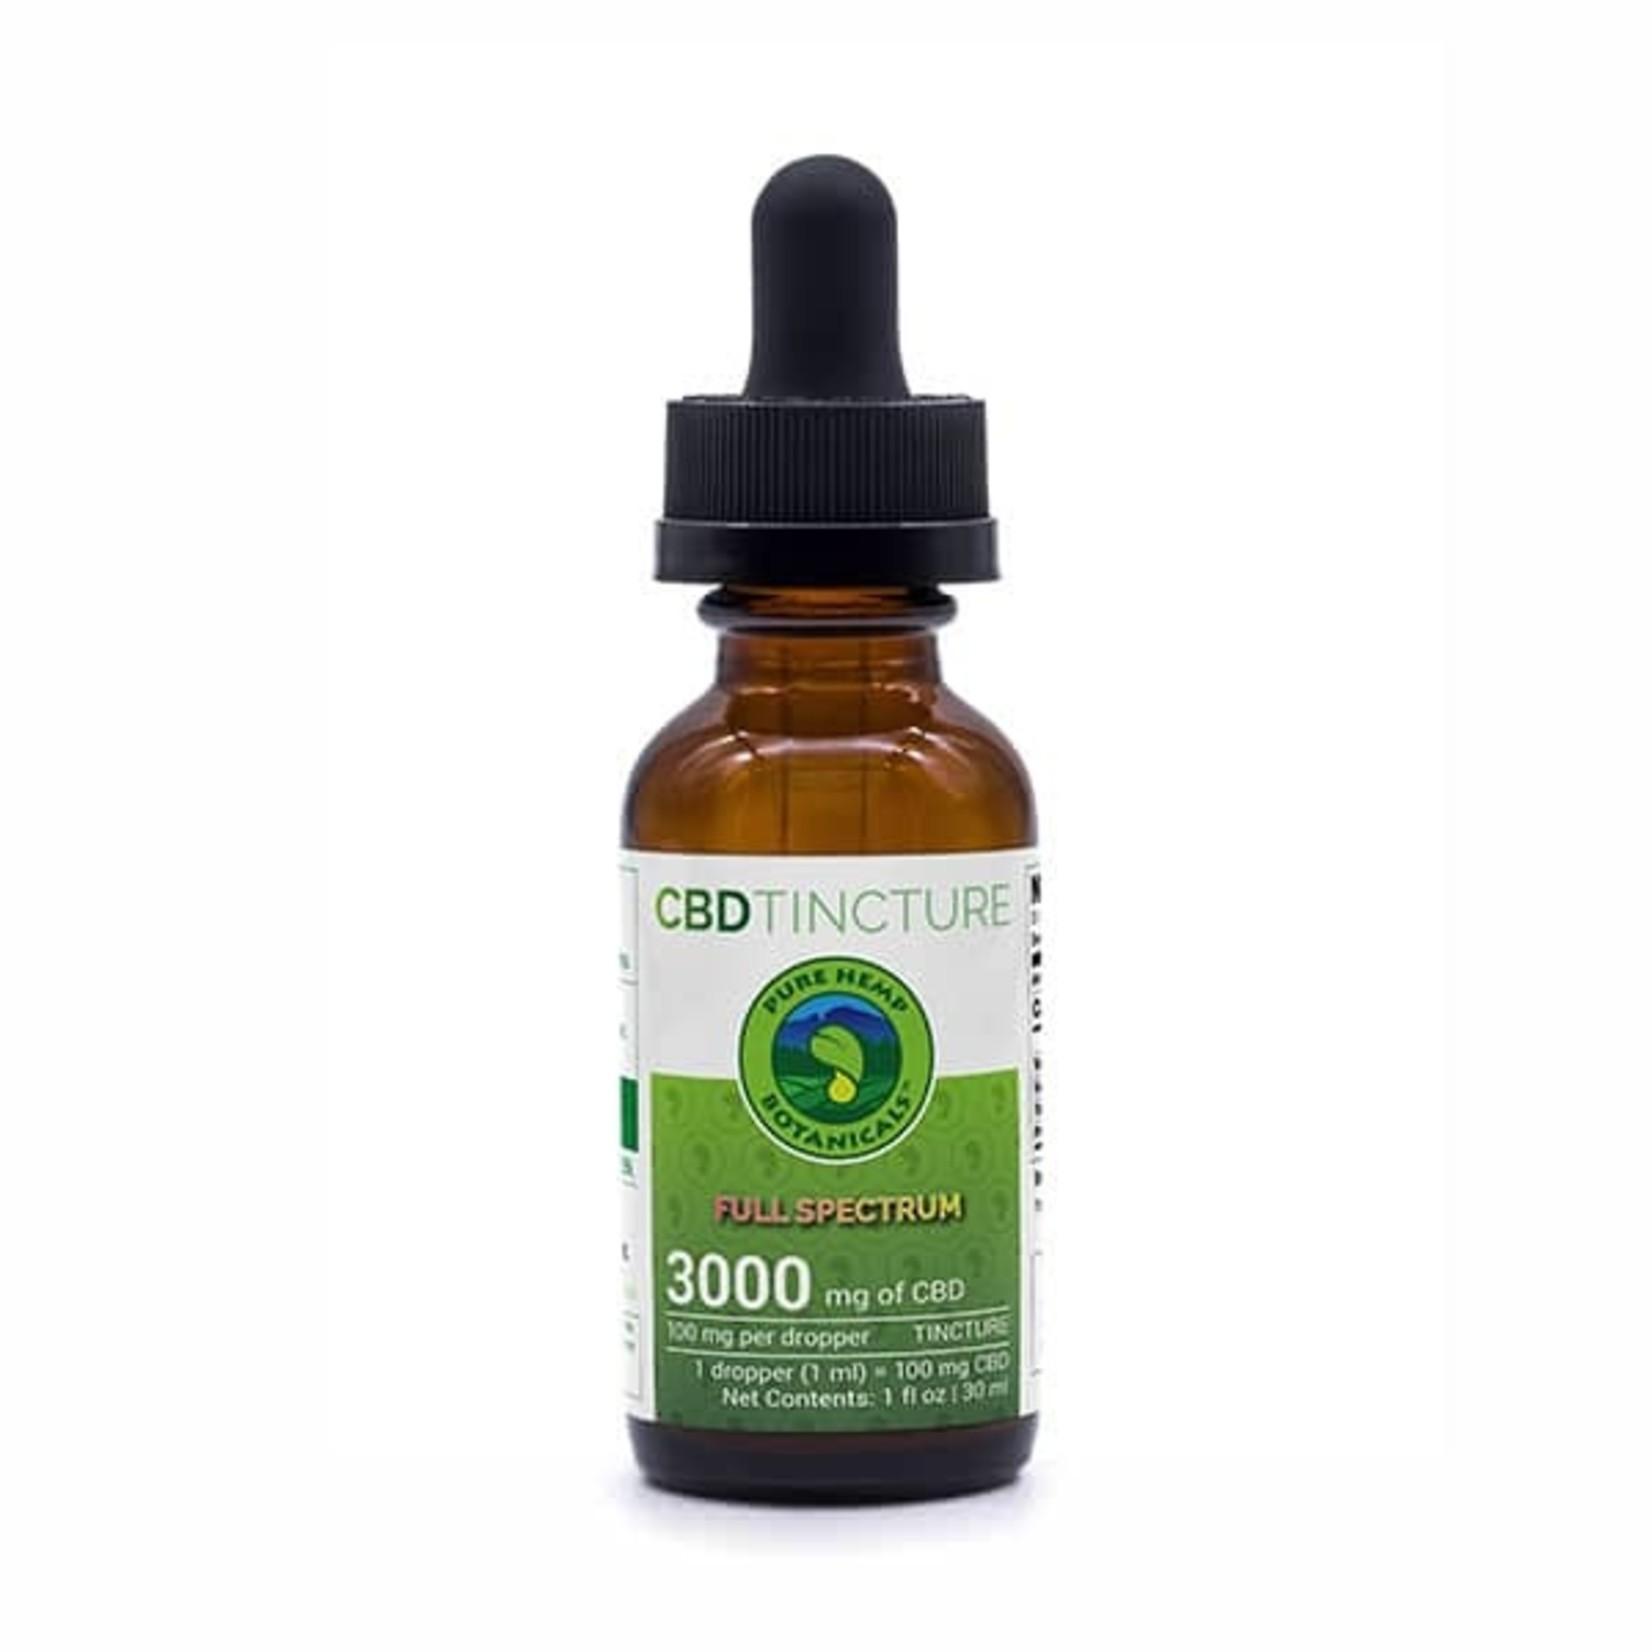 Pure Hemp Botanicals PHB Full Spectrum CBD Tincture Oil 3000mg 30ml